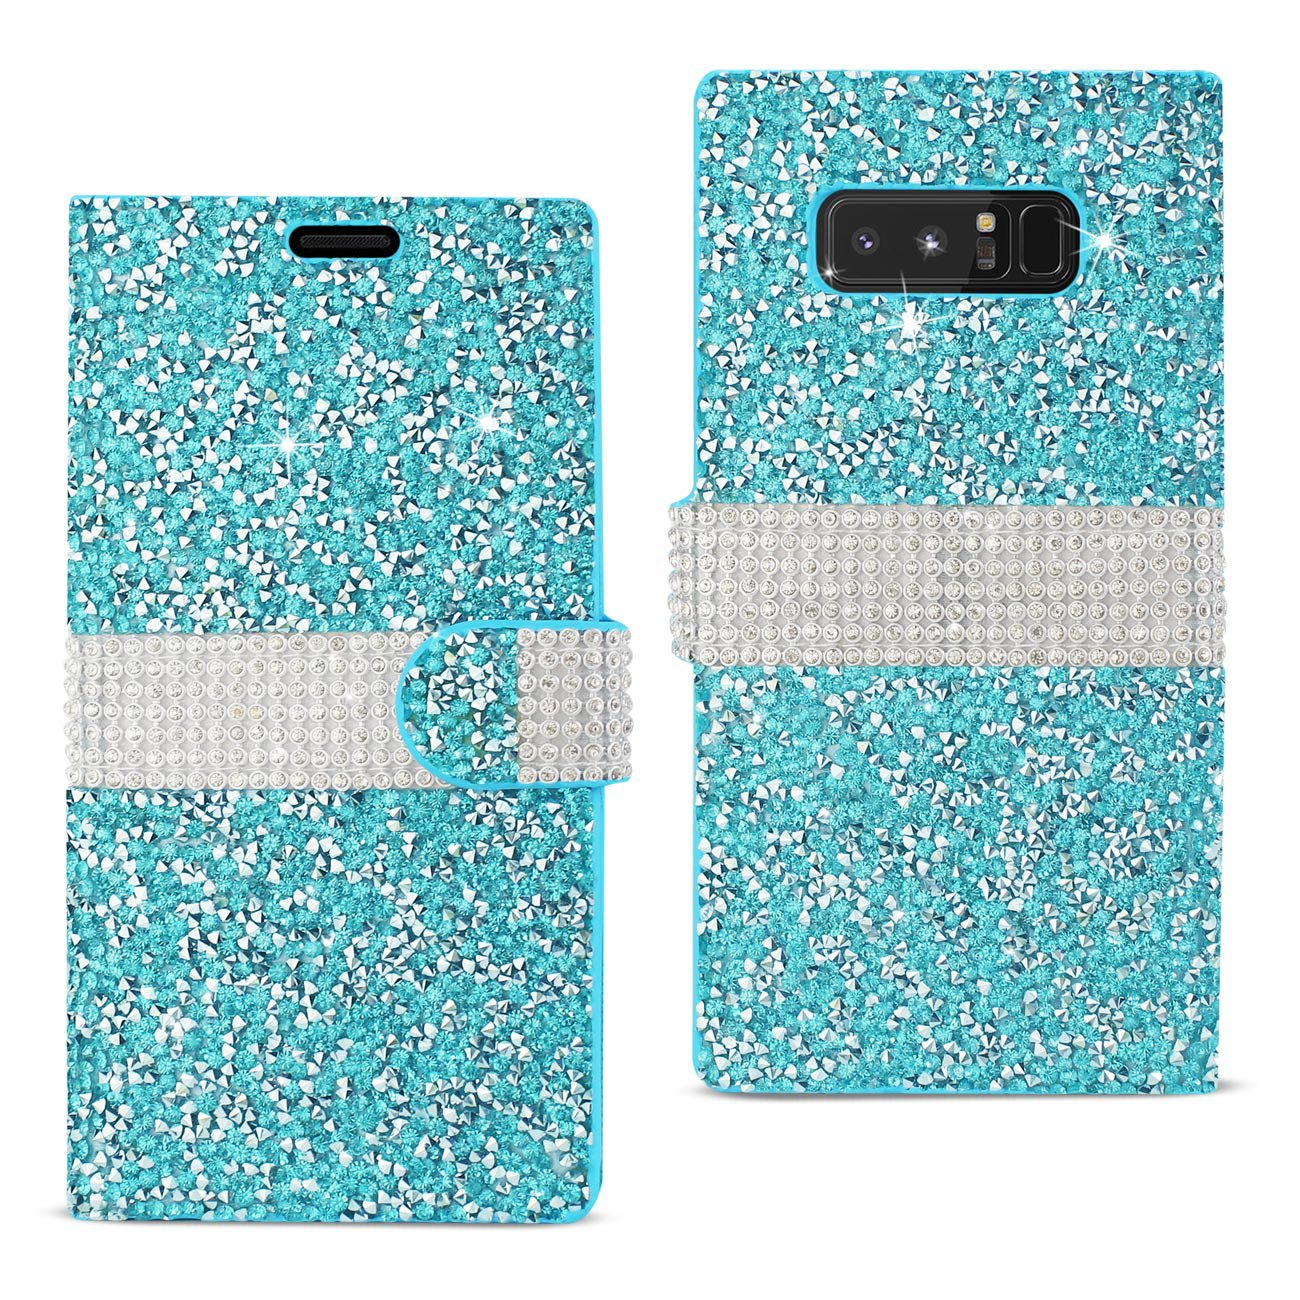 Reiko Samsung Galaxy Note 8 Diamond Rhinestone Wallet Case In Blue DFC02-SAMNOTE8BL